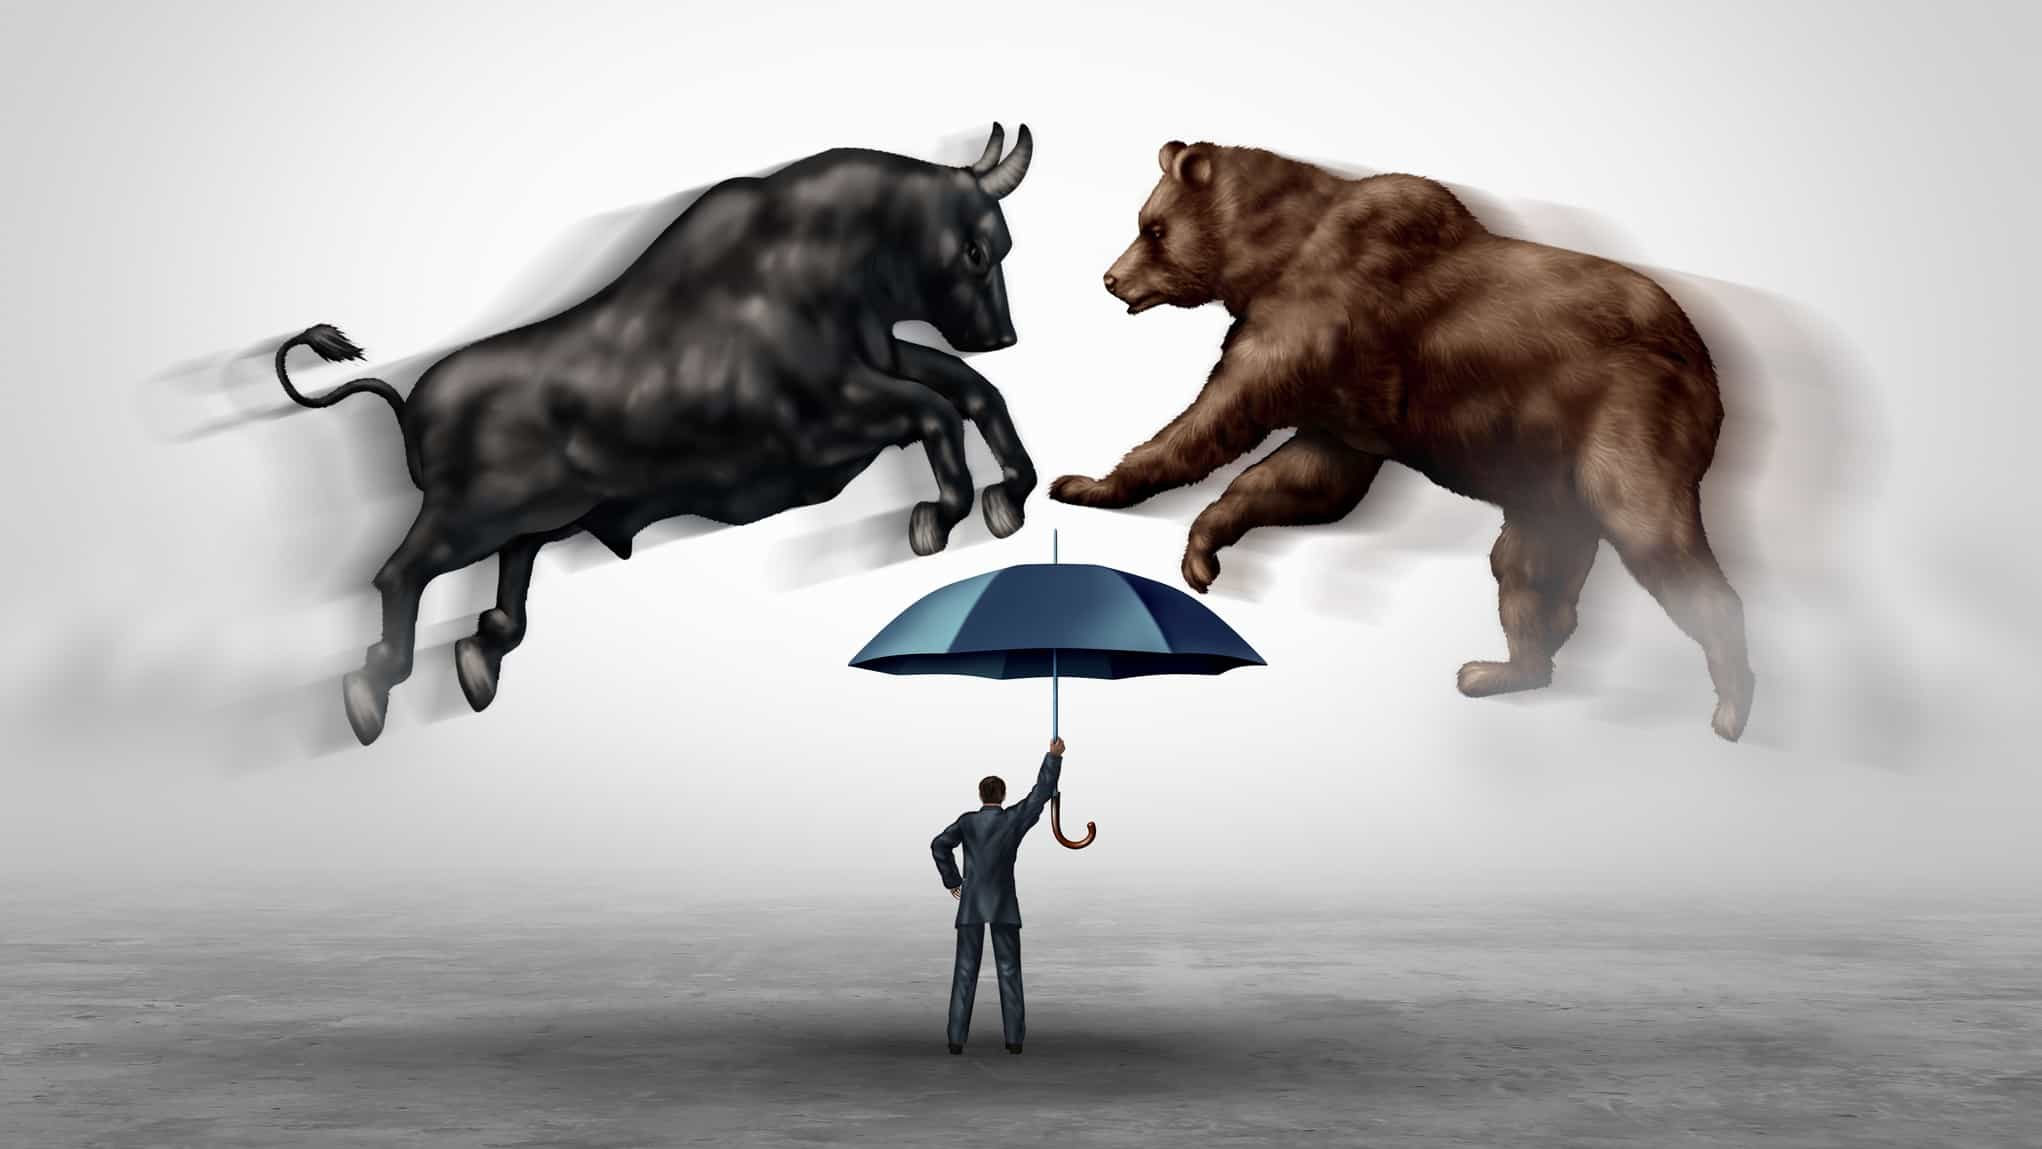 Bear and bull colliding over man holding an umbrella, asx 200 bull market